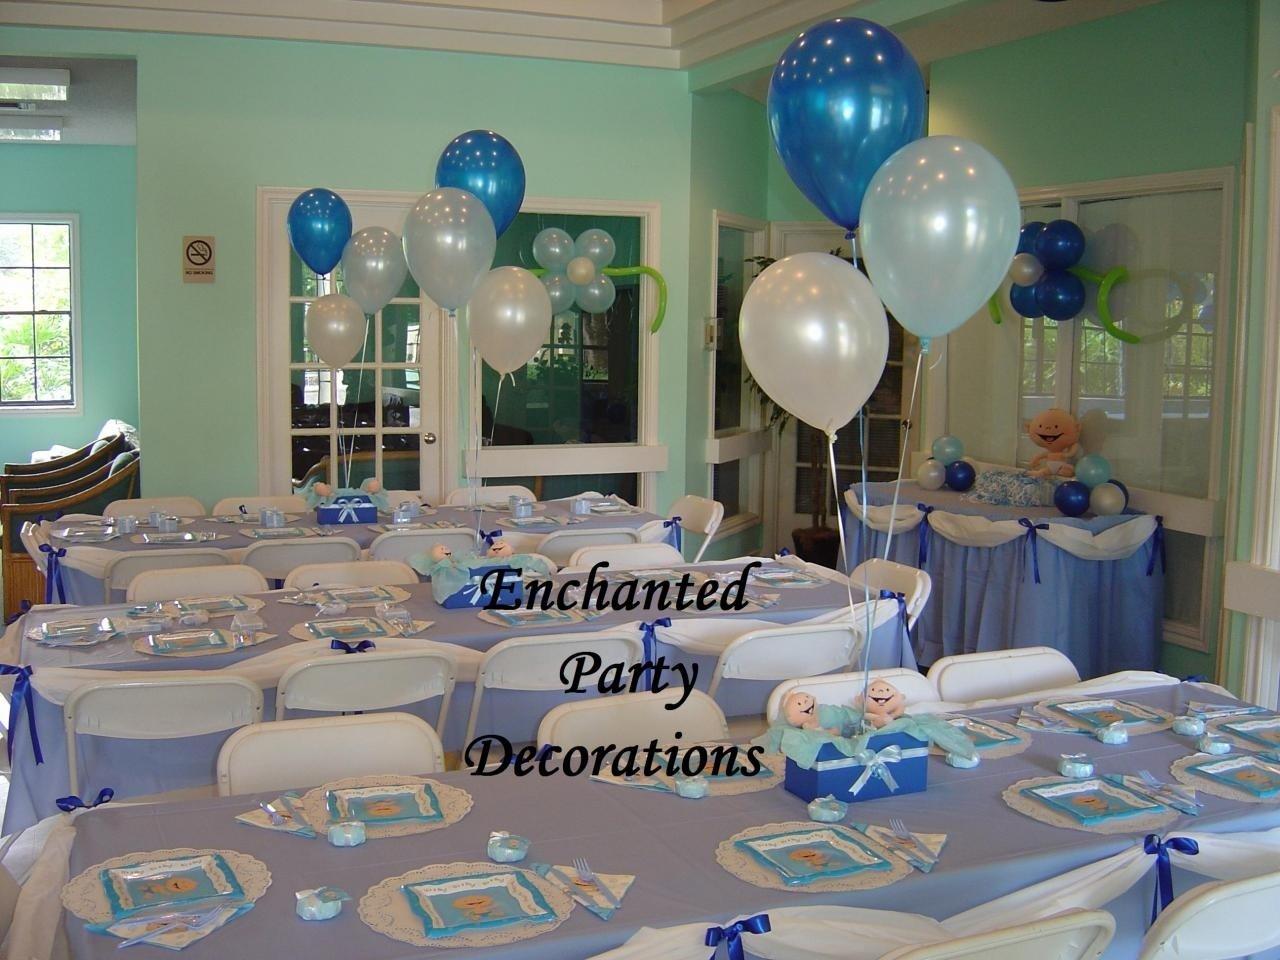 10 Fabulous Baby Shower Table Decoration Ideas baby shower ideas table decorations homes alternative 58195 2020